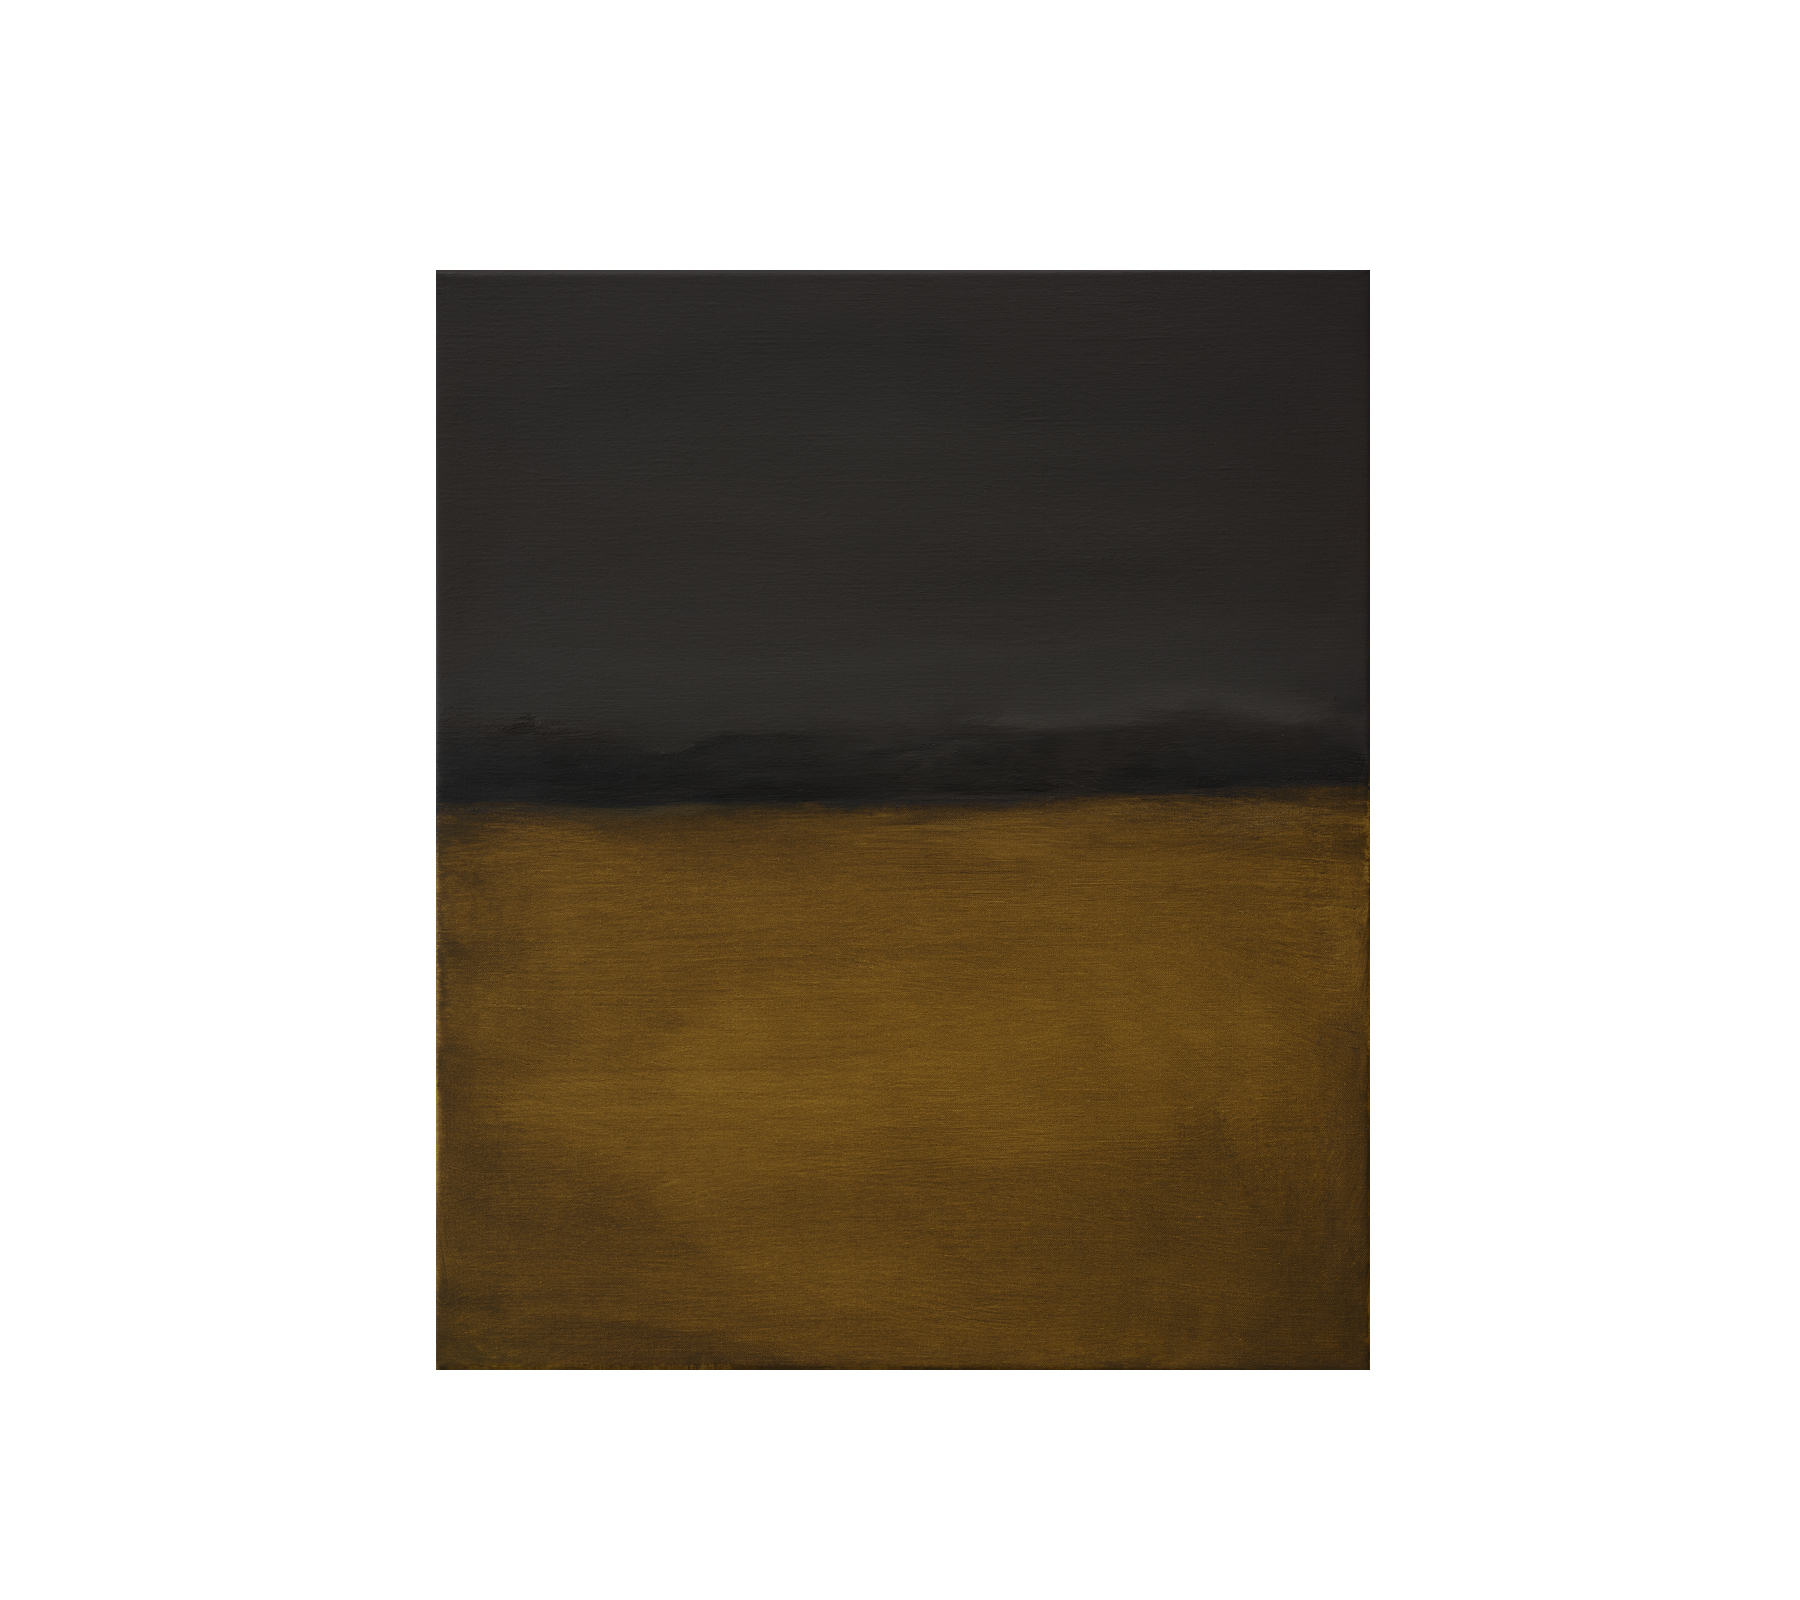 Untitled 2017 50x40cm